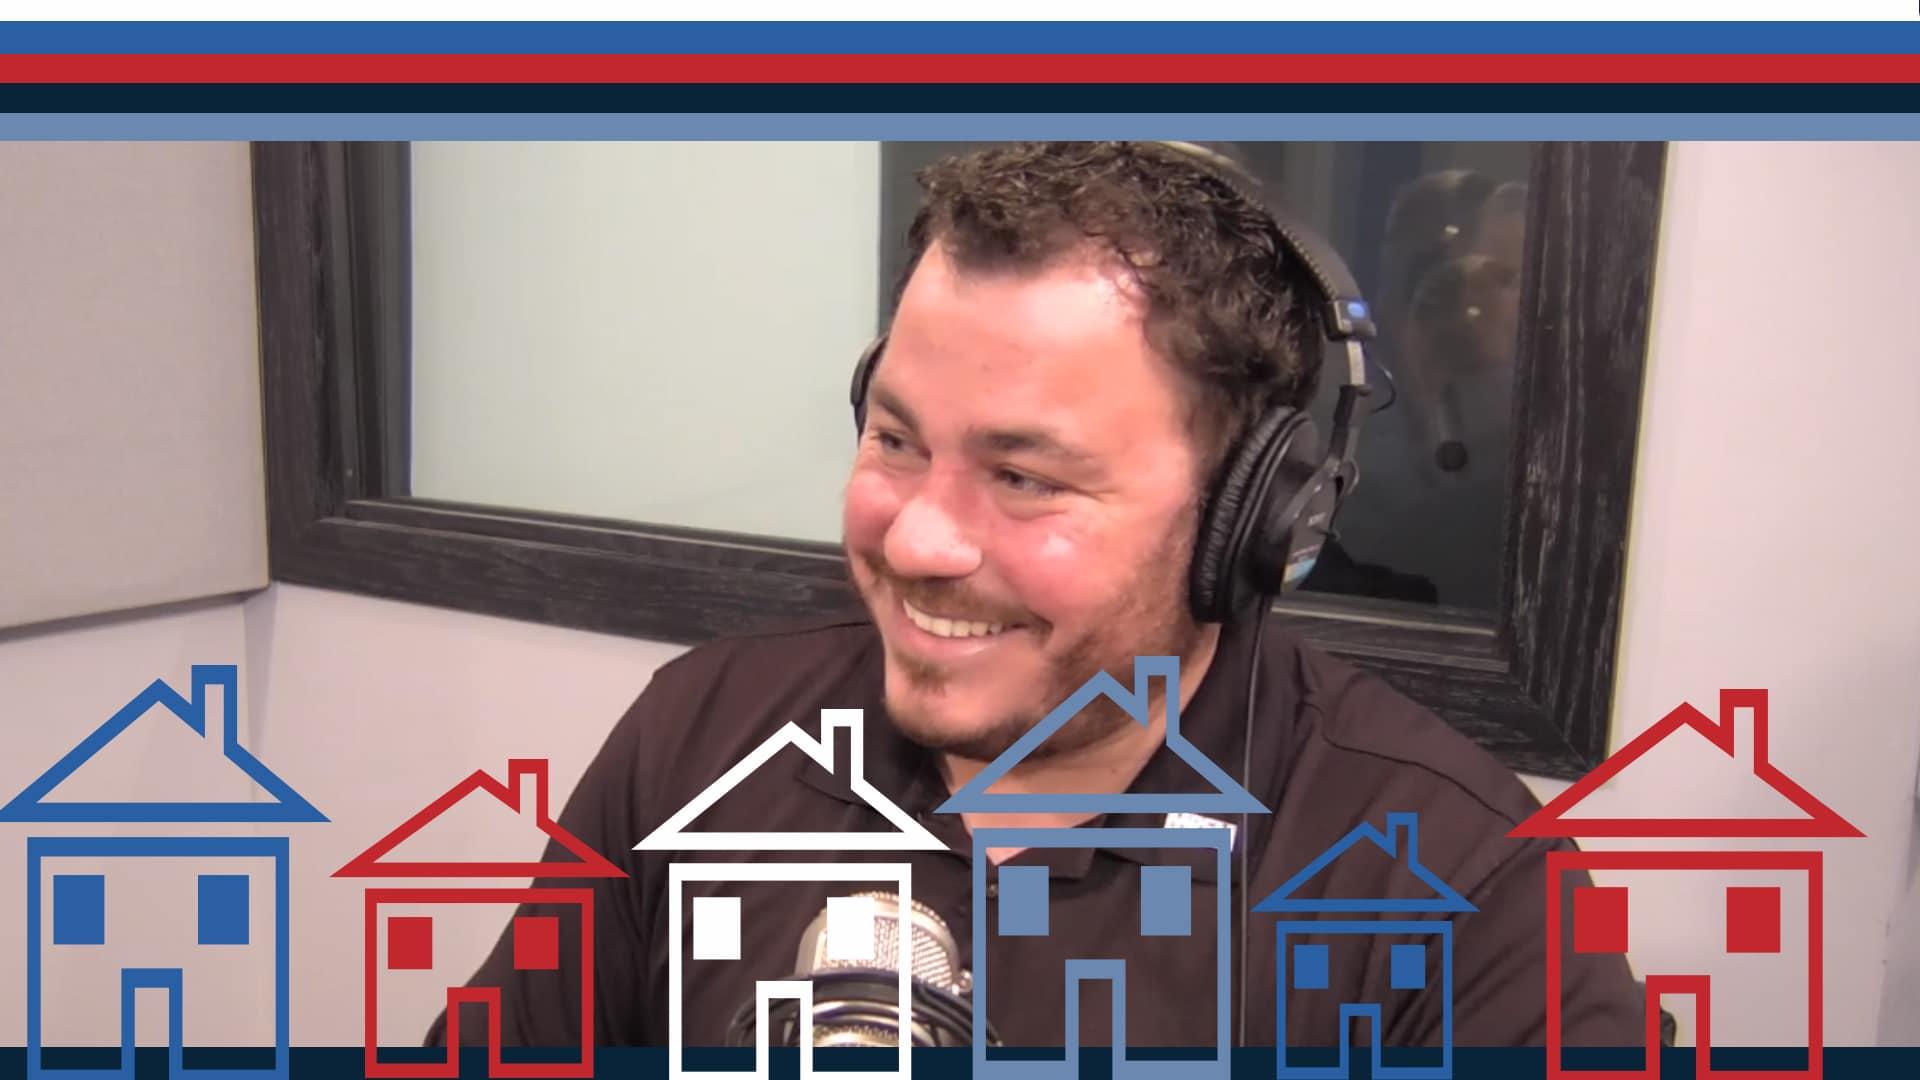 Real Estate Realities - Episode 4